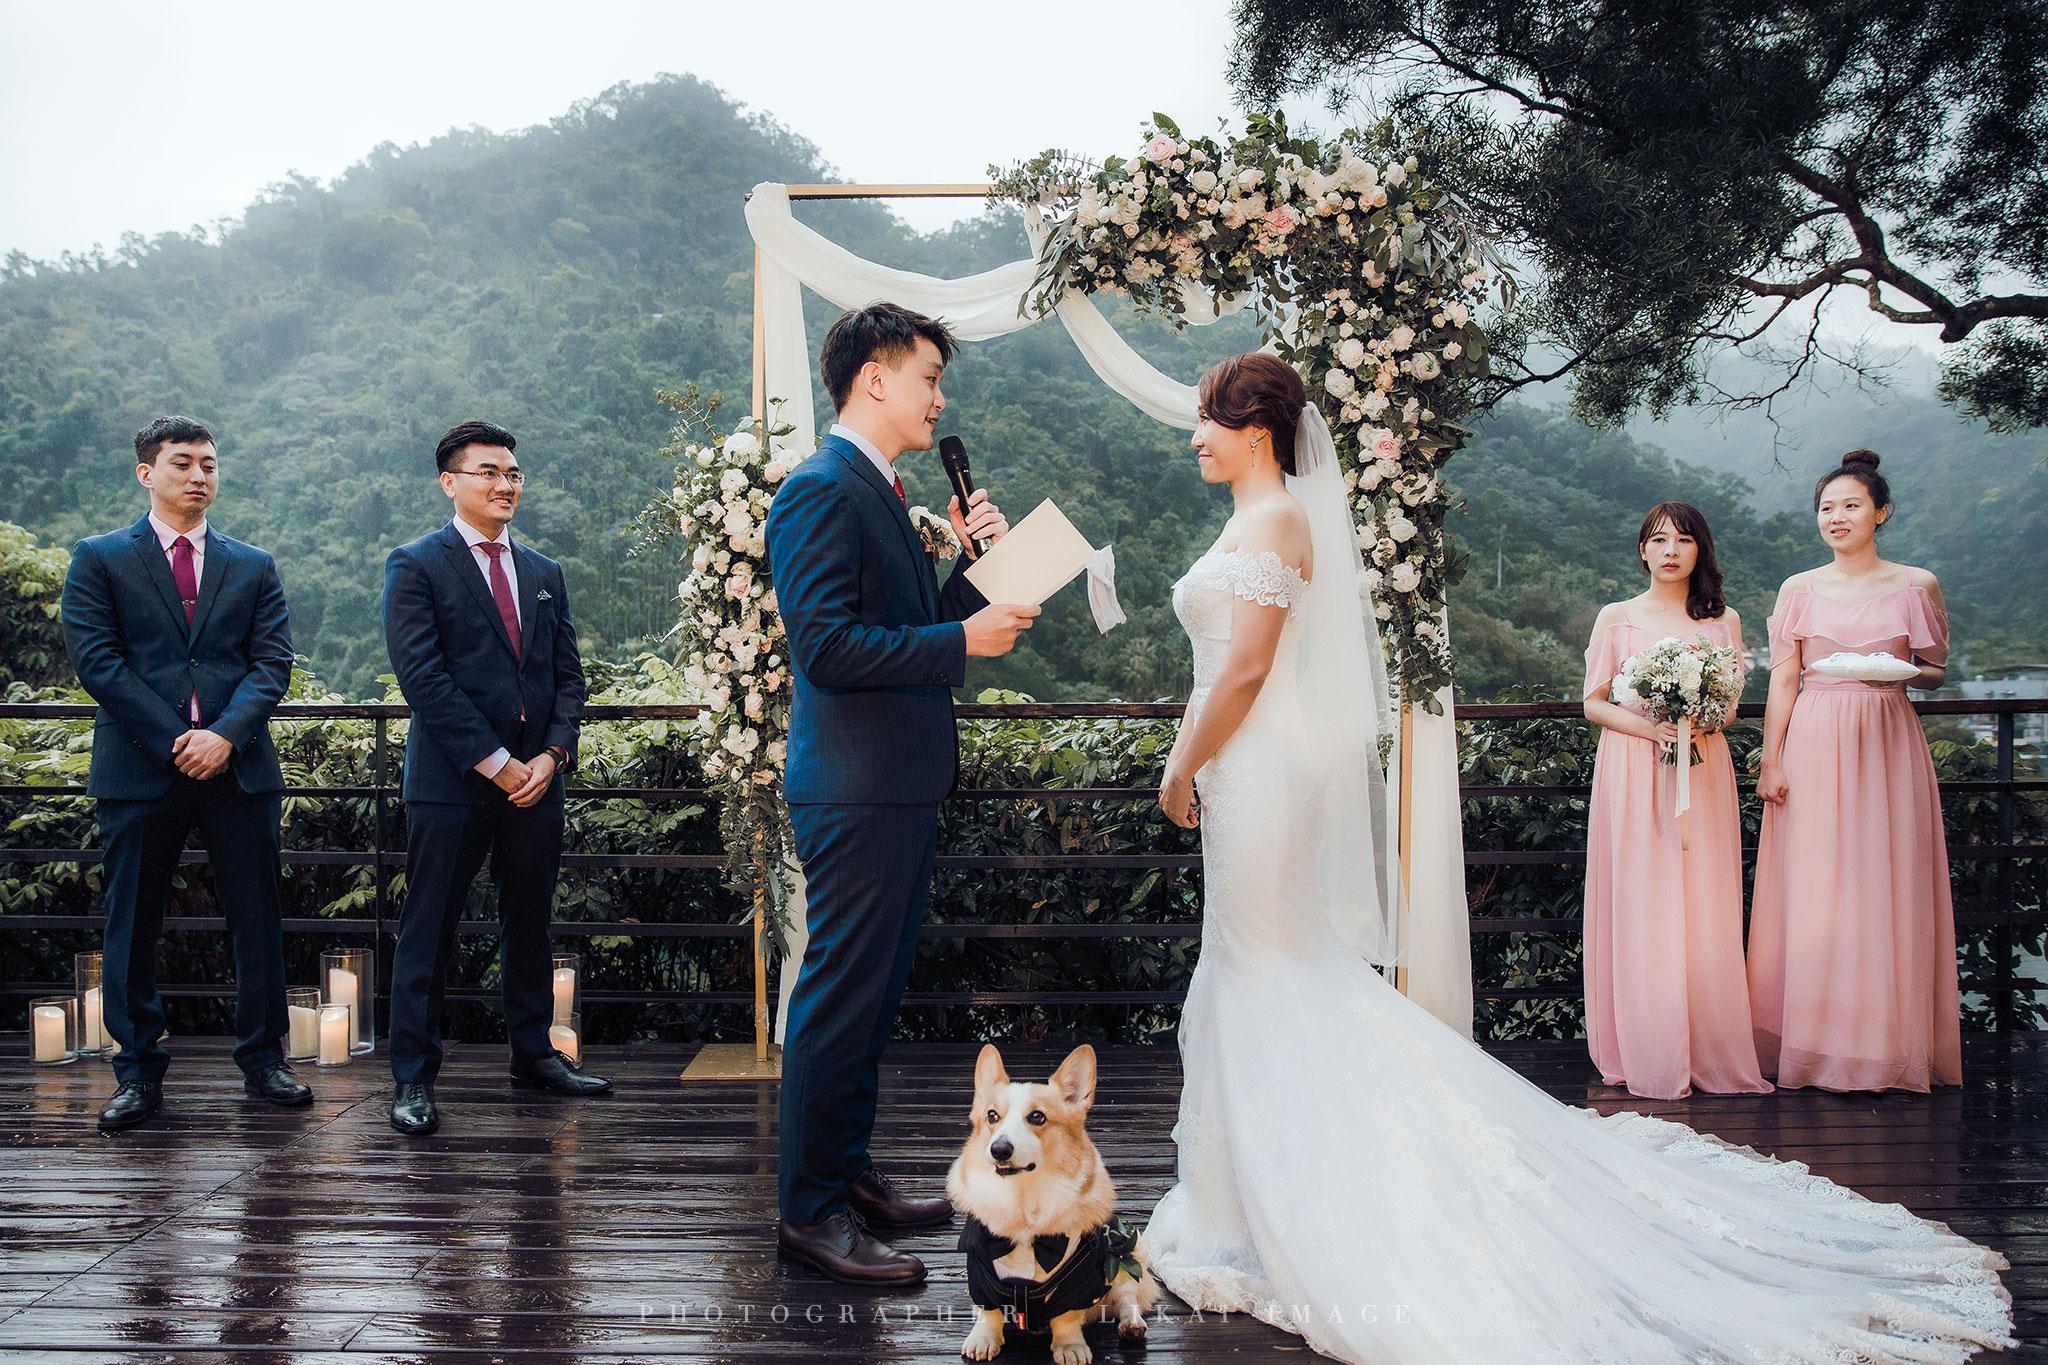 婚禮紀錄 - Dehua & Vicky - 烏來La Villa